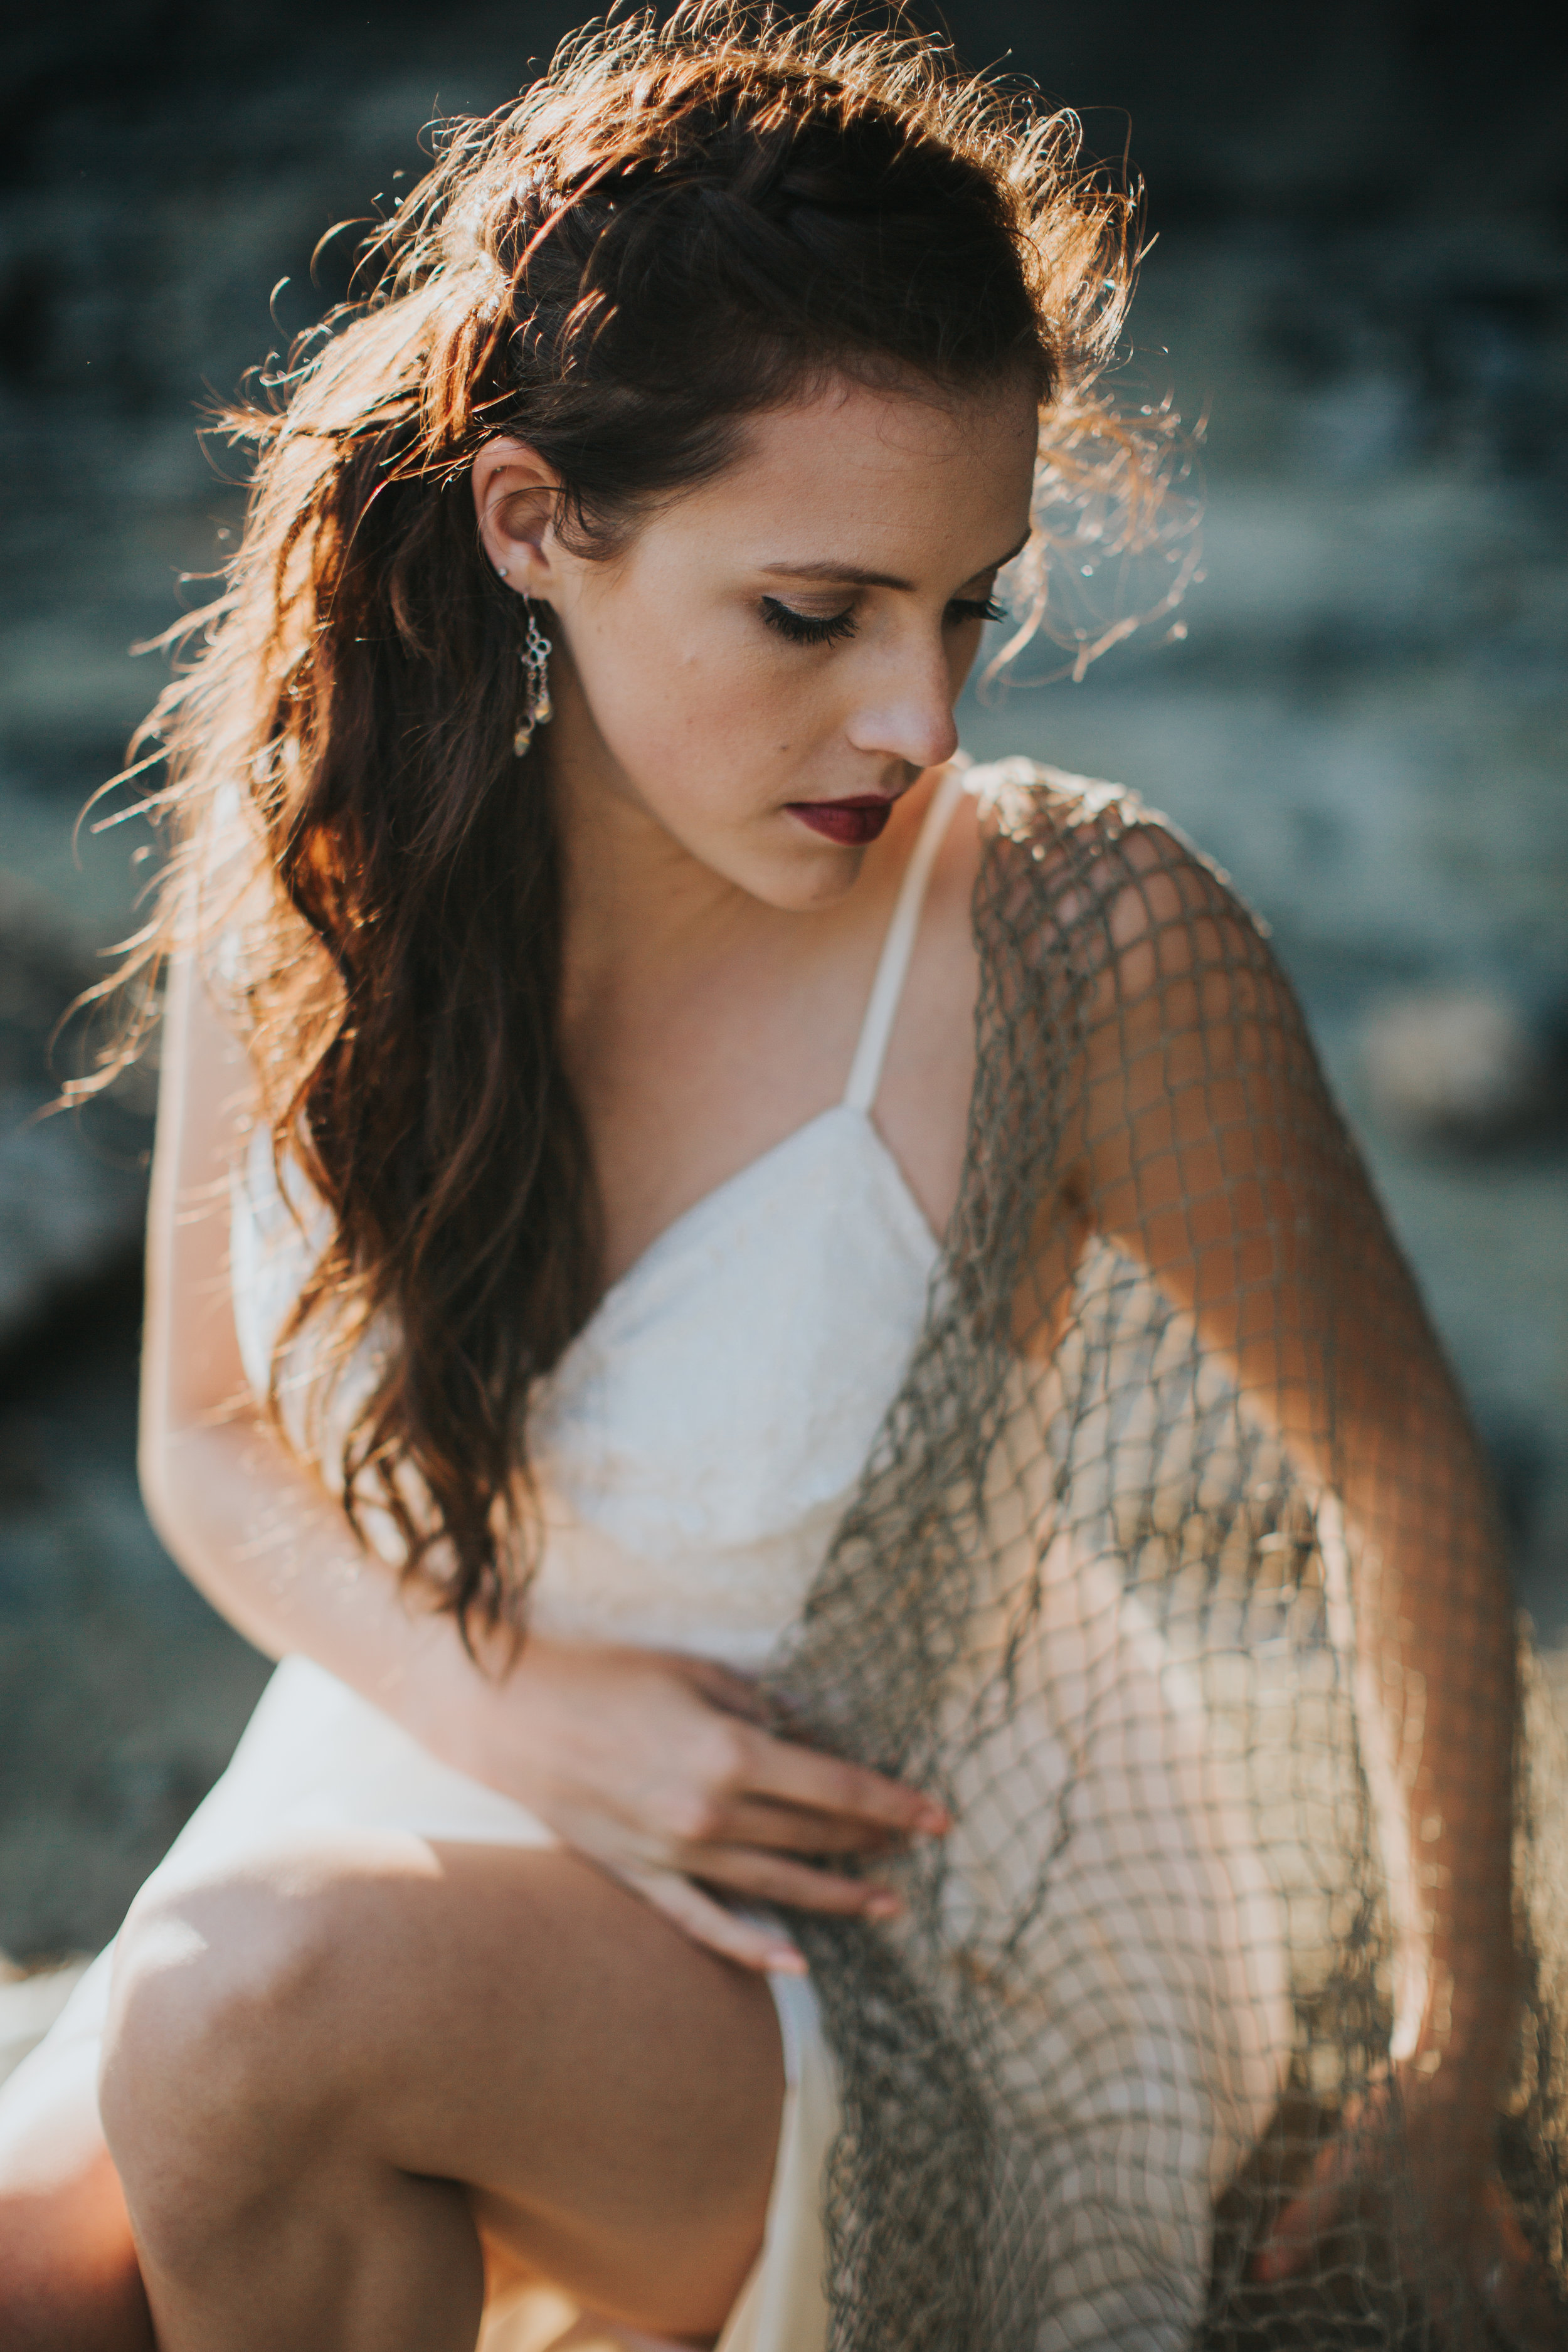 Port-Angeles-Salt-Creek-beach-wedding-bride-PNW-olympic-peninsula-photographer-Kayla-Dawn-Photography-outdoors-golden-hour-dancer-dress (25).jpg